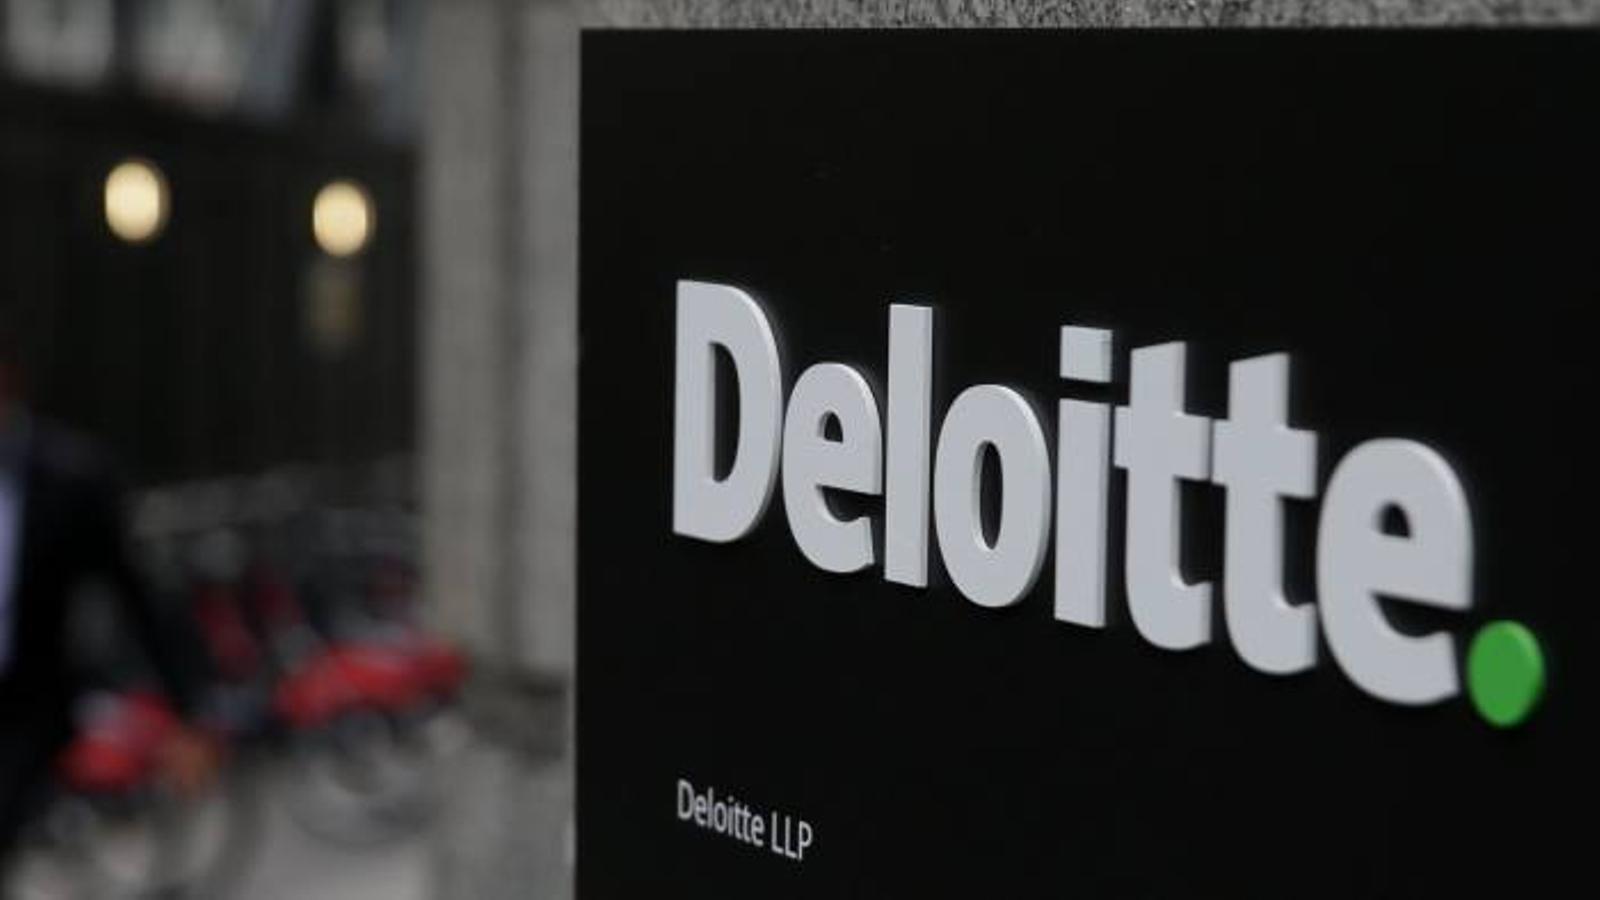 Una façana d'una consultoria de Deloitte. / ARXIU ANA